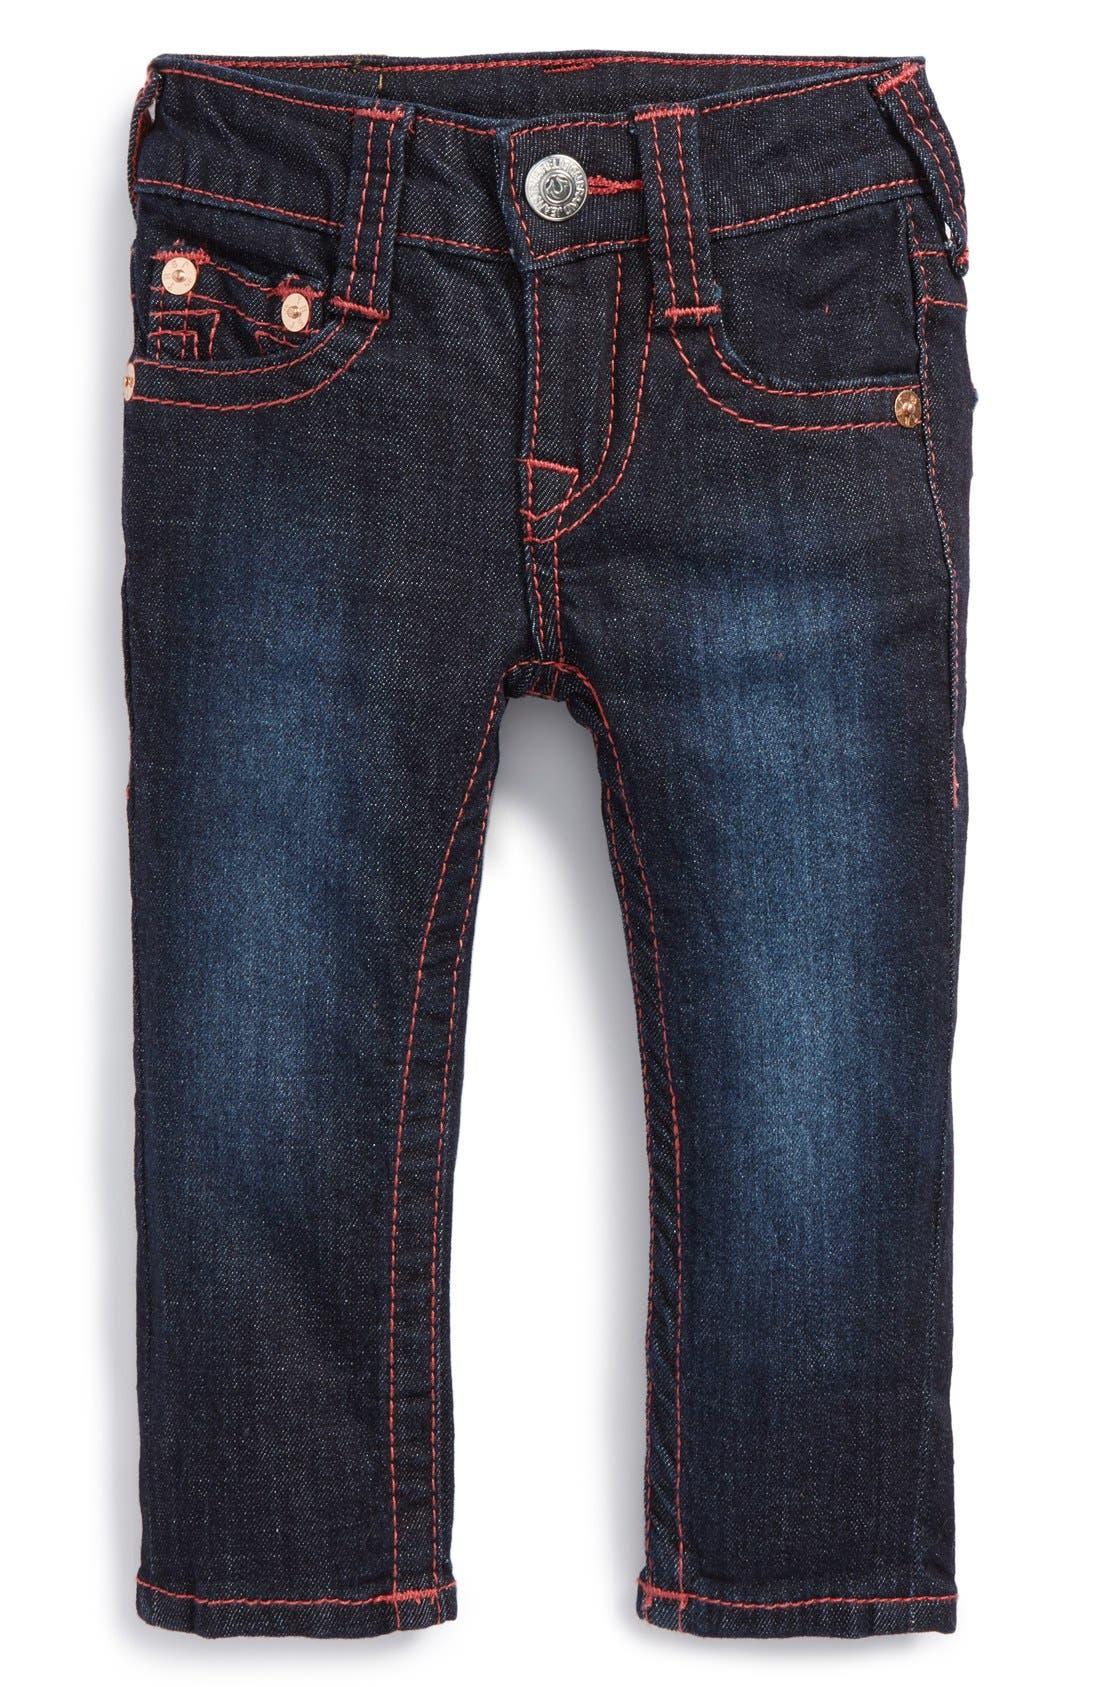 True Religion Brand Jeans 'Stella' Skinny Jeans (Baby Girls)